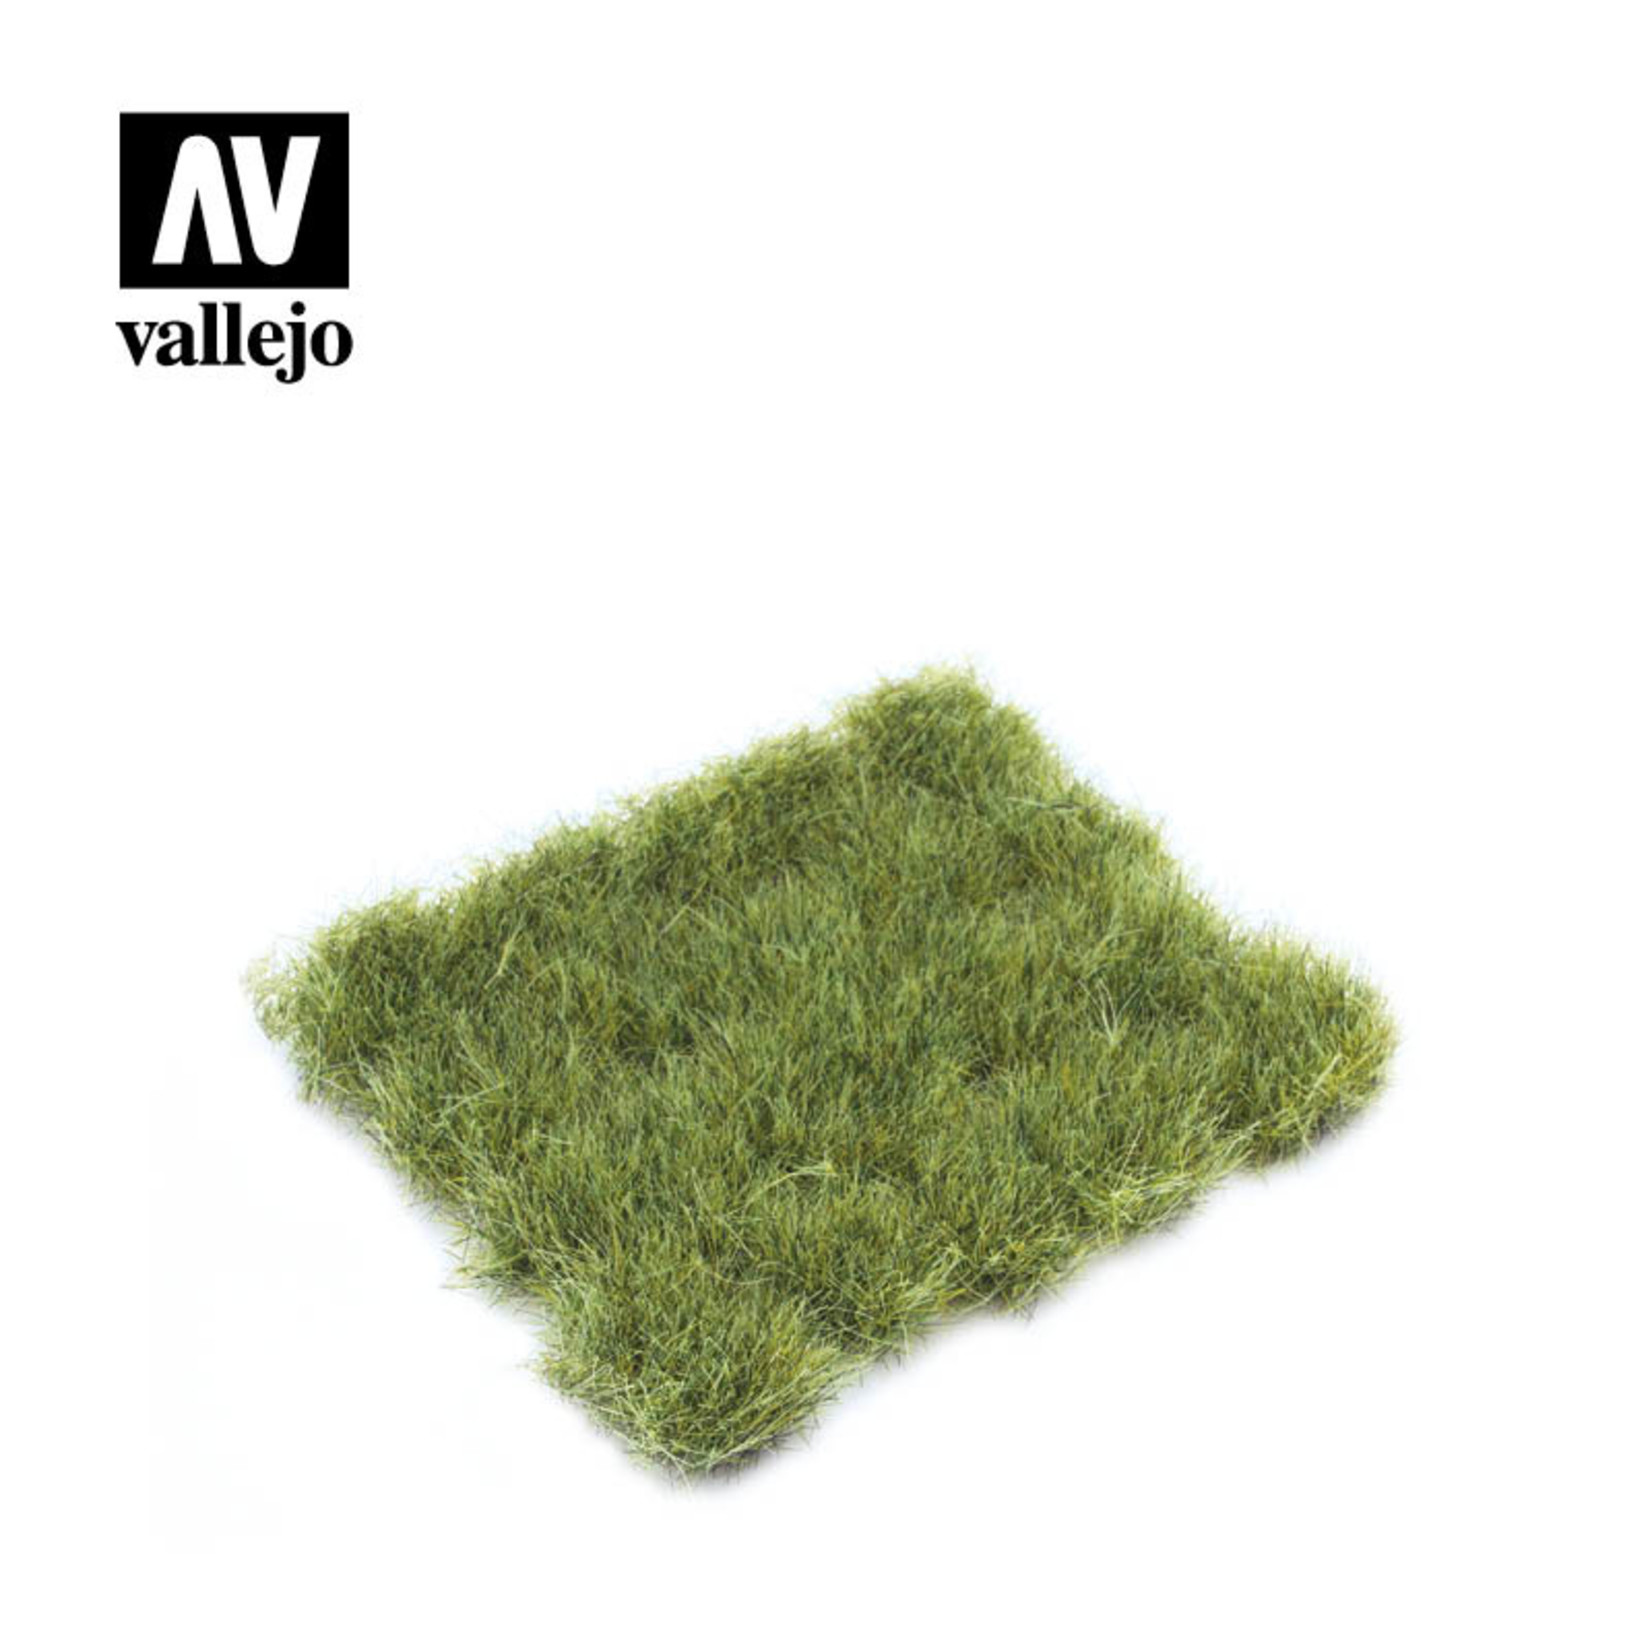 Vallejo Vallejo Scenery: Wild Tuft: Jungle: Extra Large